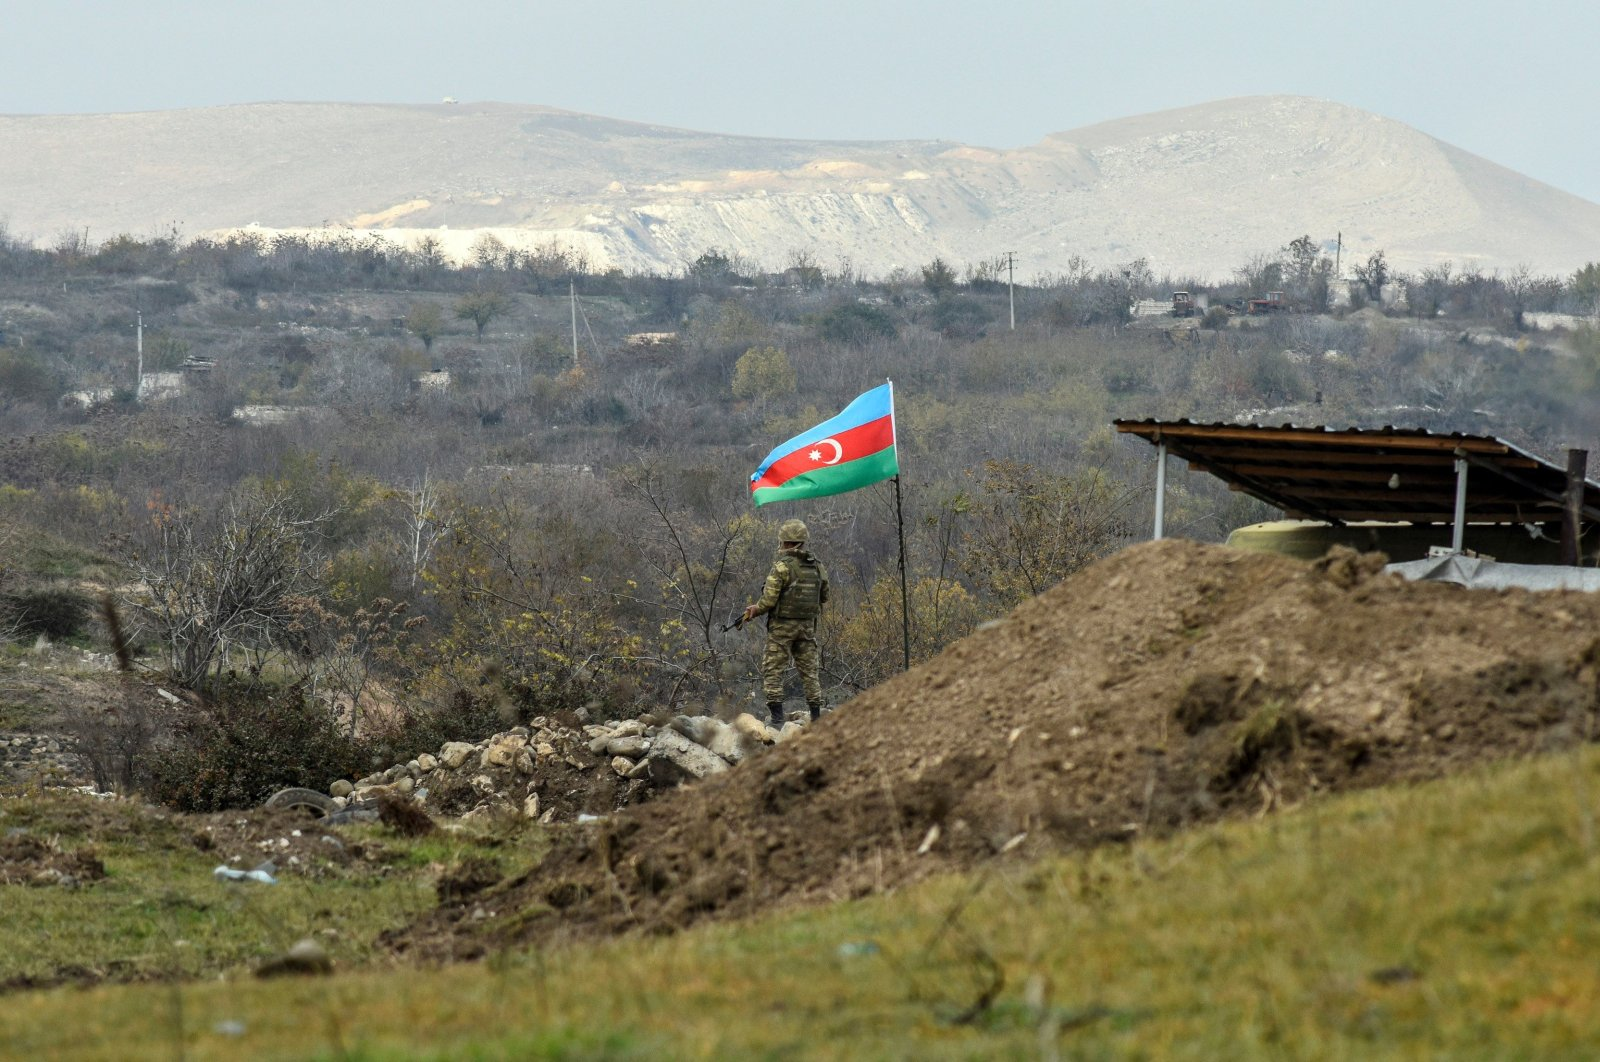 An Azerbaijani soldier stands guard at a checkpoint on a road entering Fuzuli province, Azerbaijan, Dec. 2, 2020. (AFP Photo)